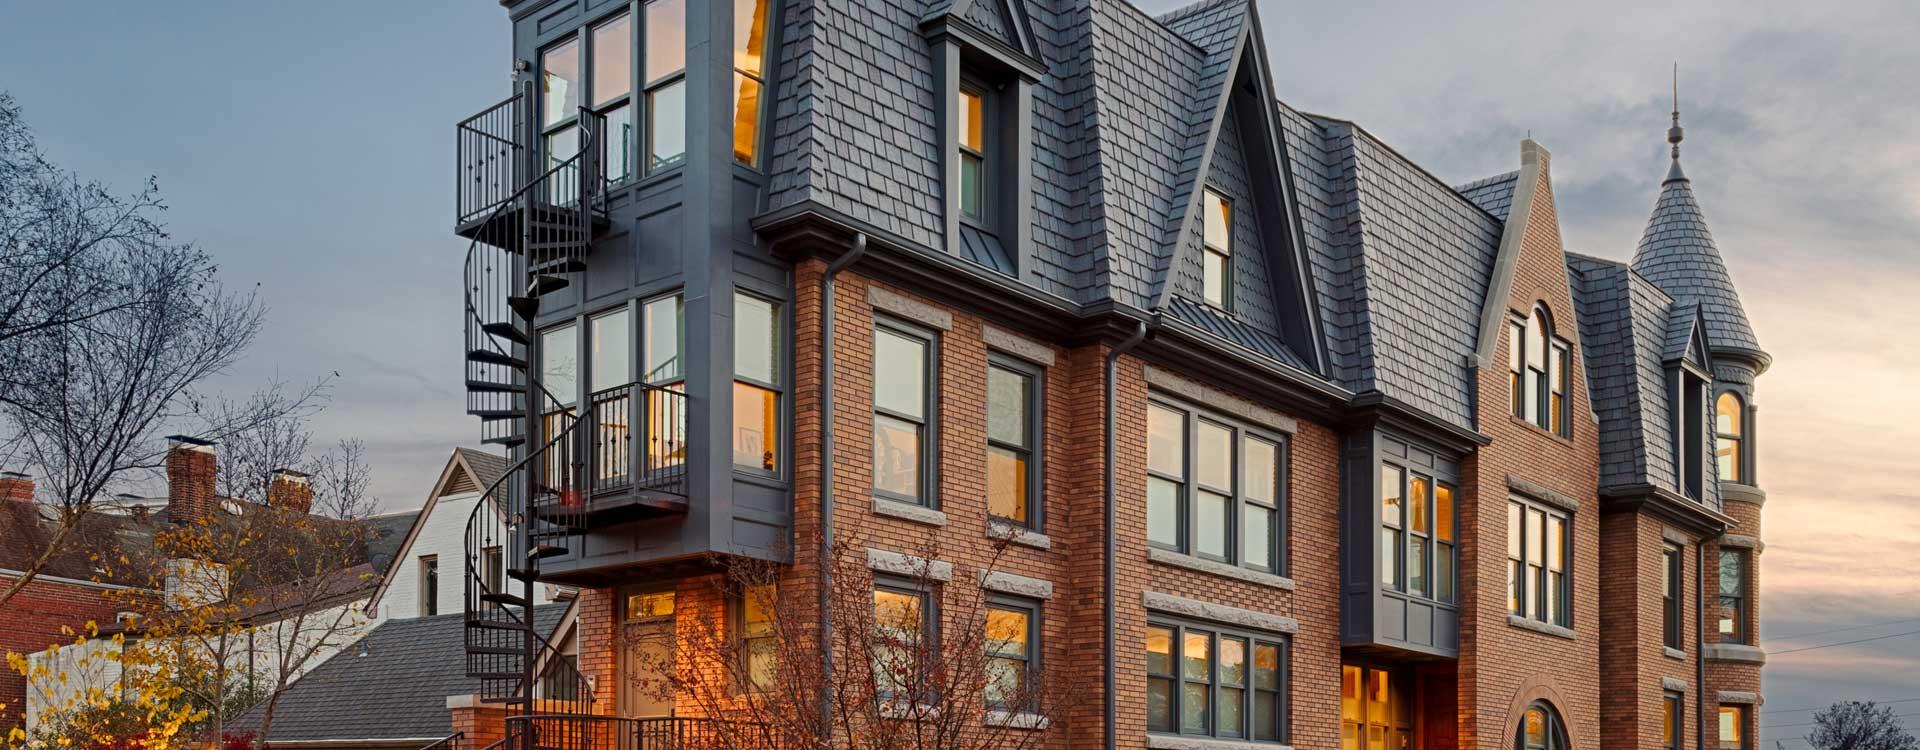 A New Brick Home On The Hague In Norfolk Virginia Built By Covington Contracting Luxury Custom Homebuilder In Hampton Roads Virginia